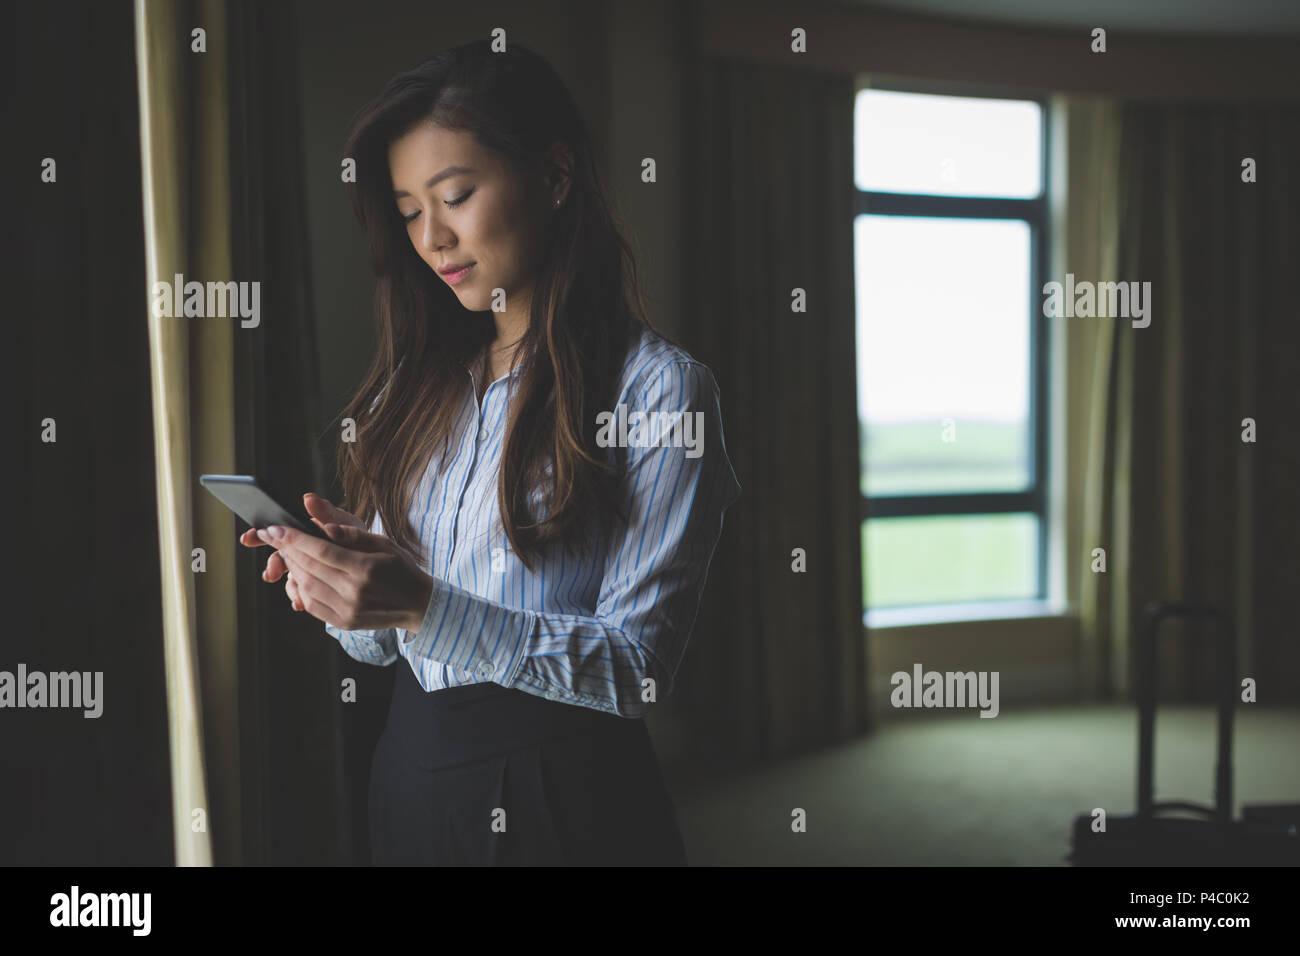 Businesswoman using mobile phone Stock Photo